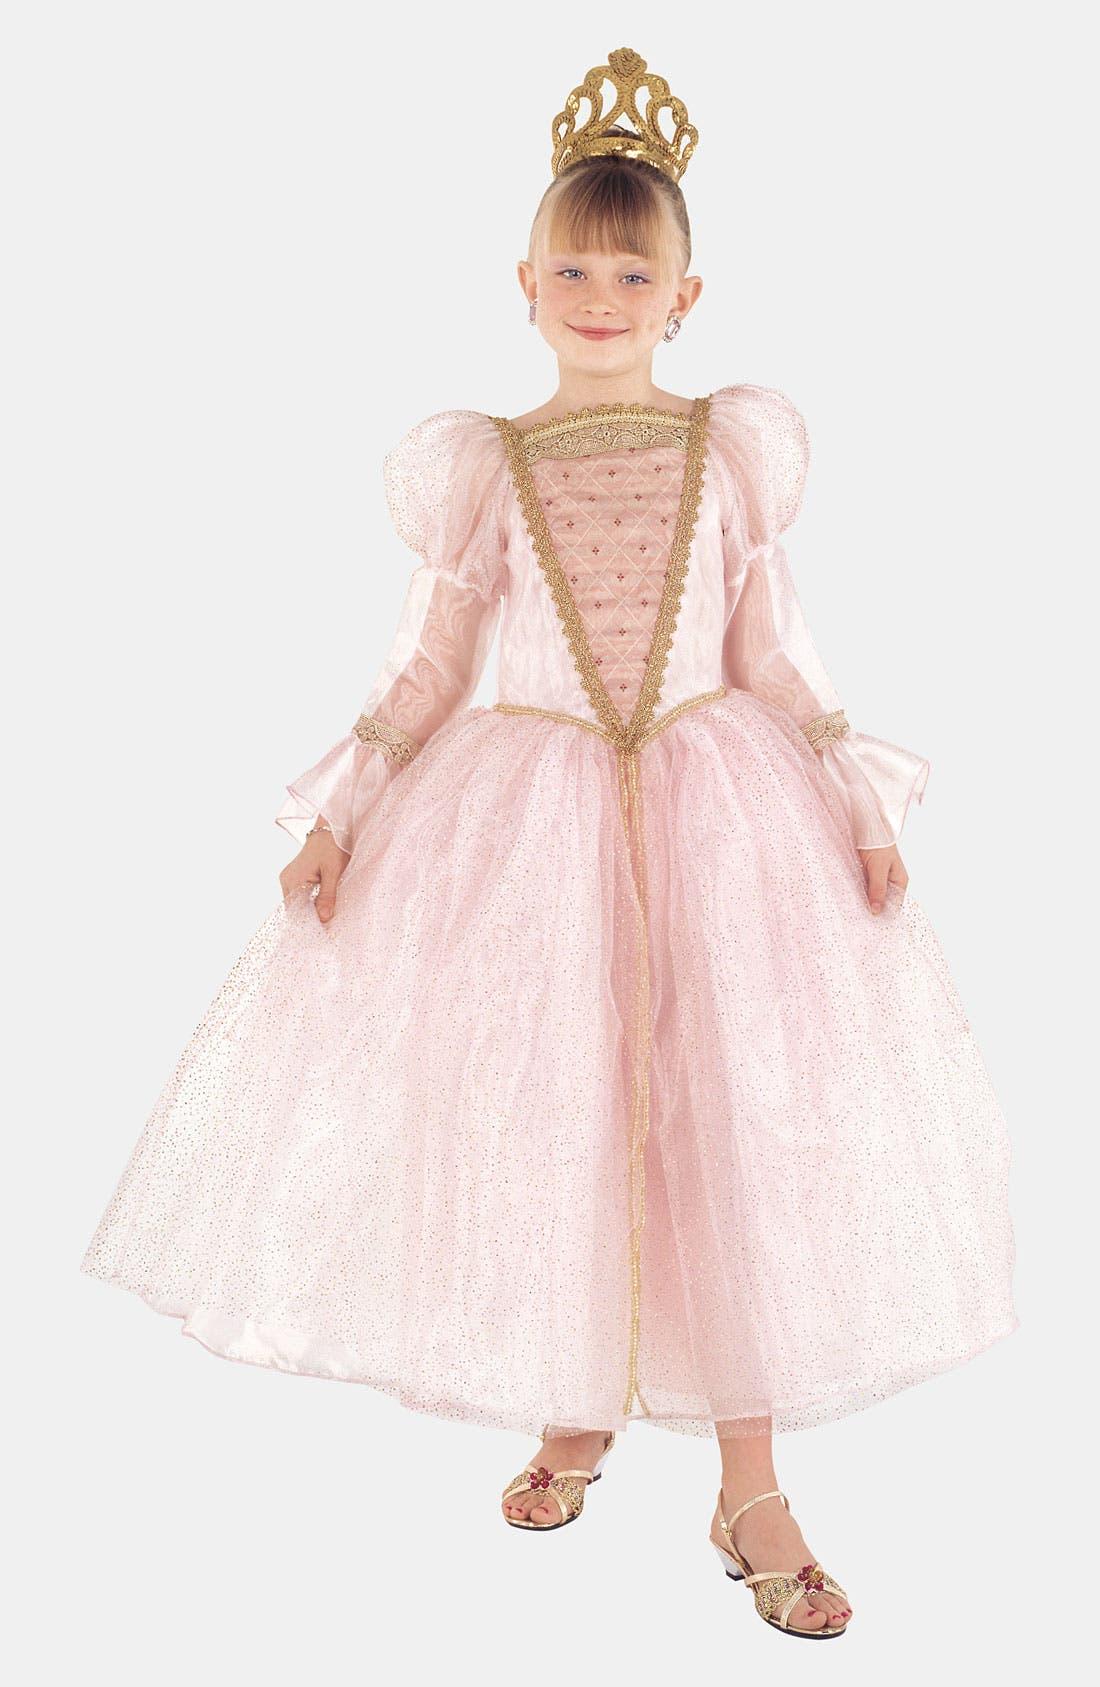 Alternate Image 1 Selected - Puppet Workshop 'Victorian' Dress (Little Girls)